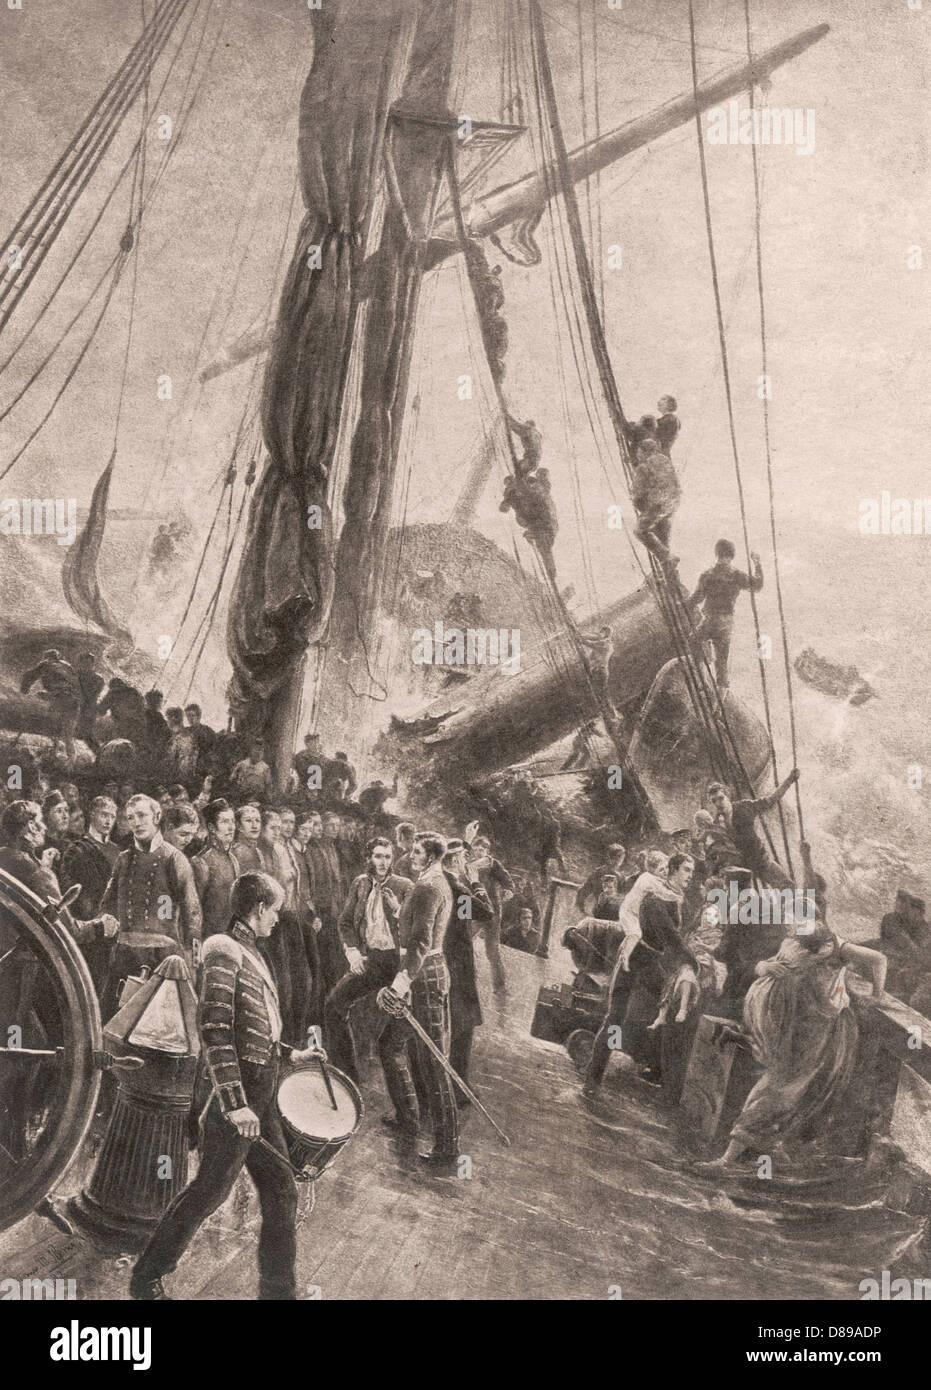 Birkenhead Wrecked B+w - Stock Image